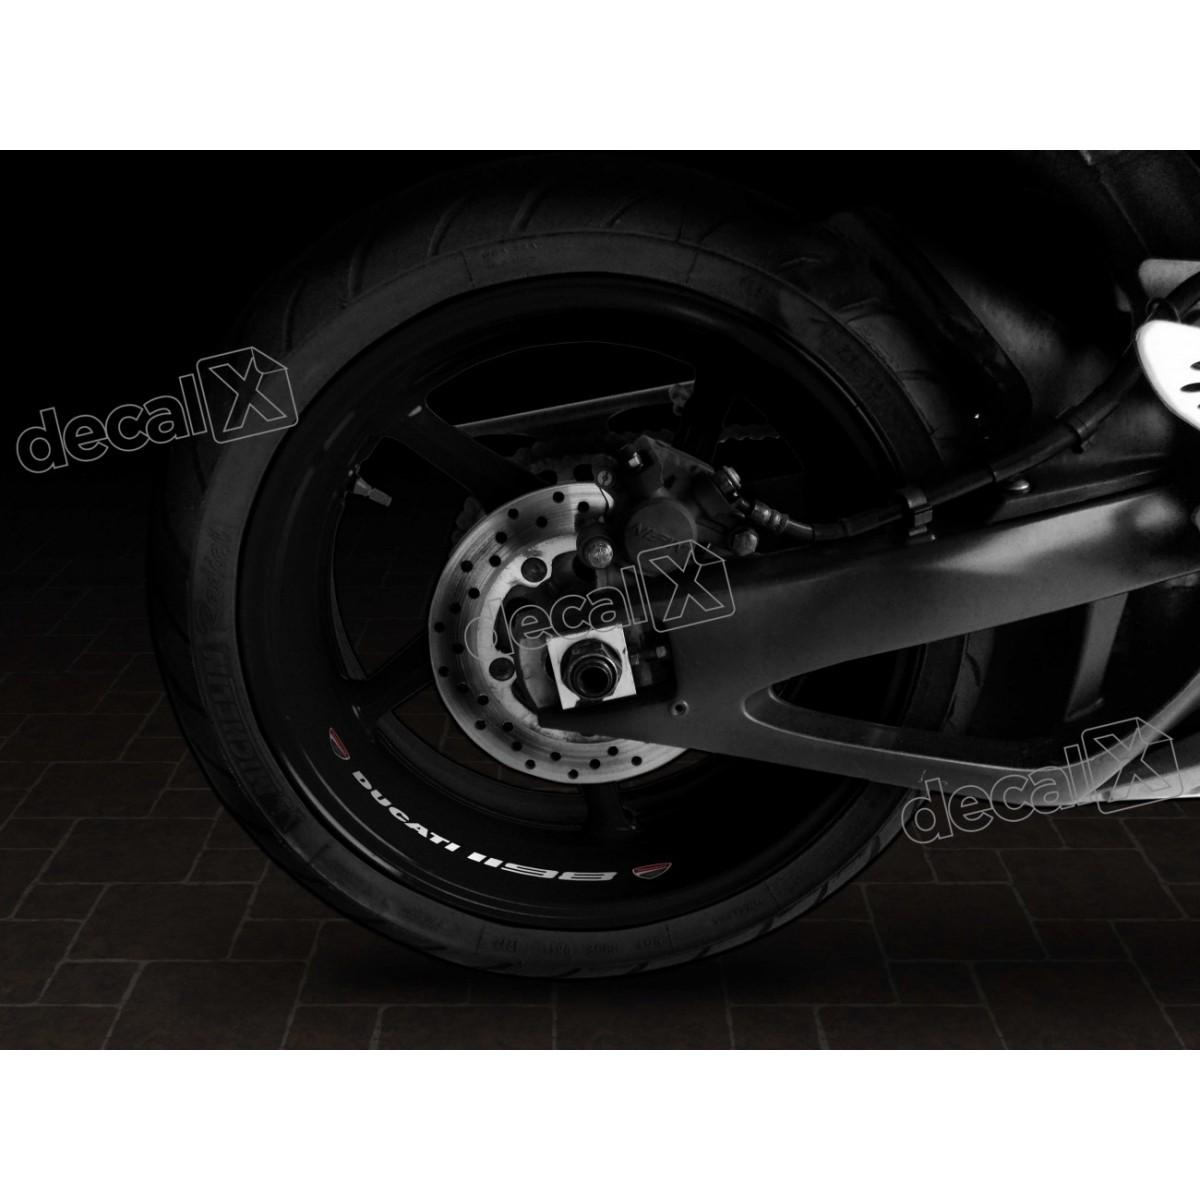 Adesivos Centro Roda Refletivo Moto Ducati 1198 Rd3 - Decalx